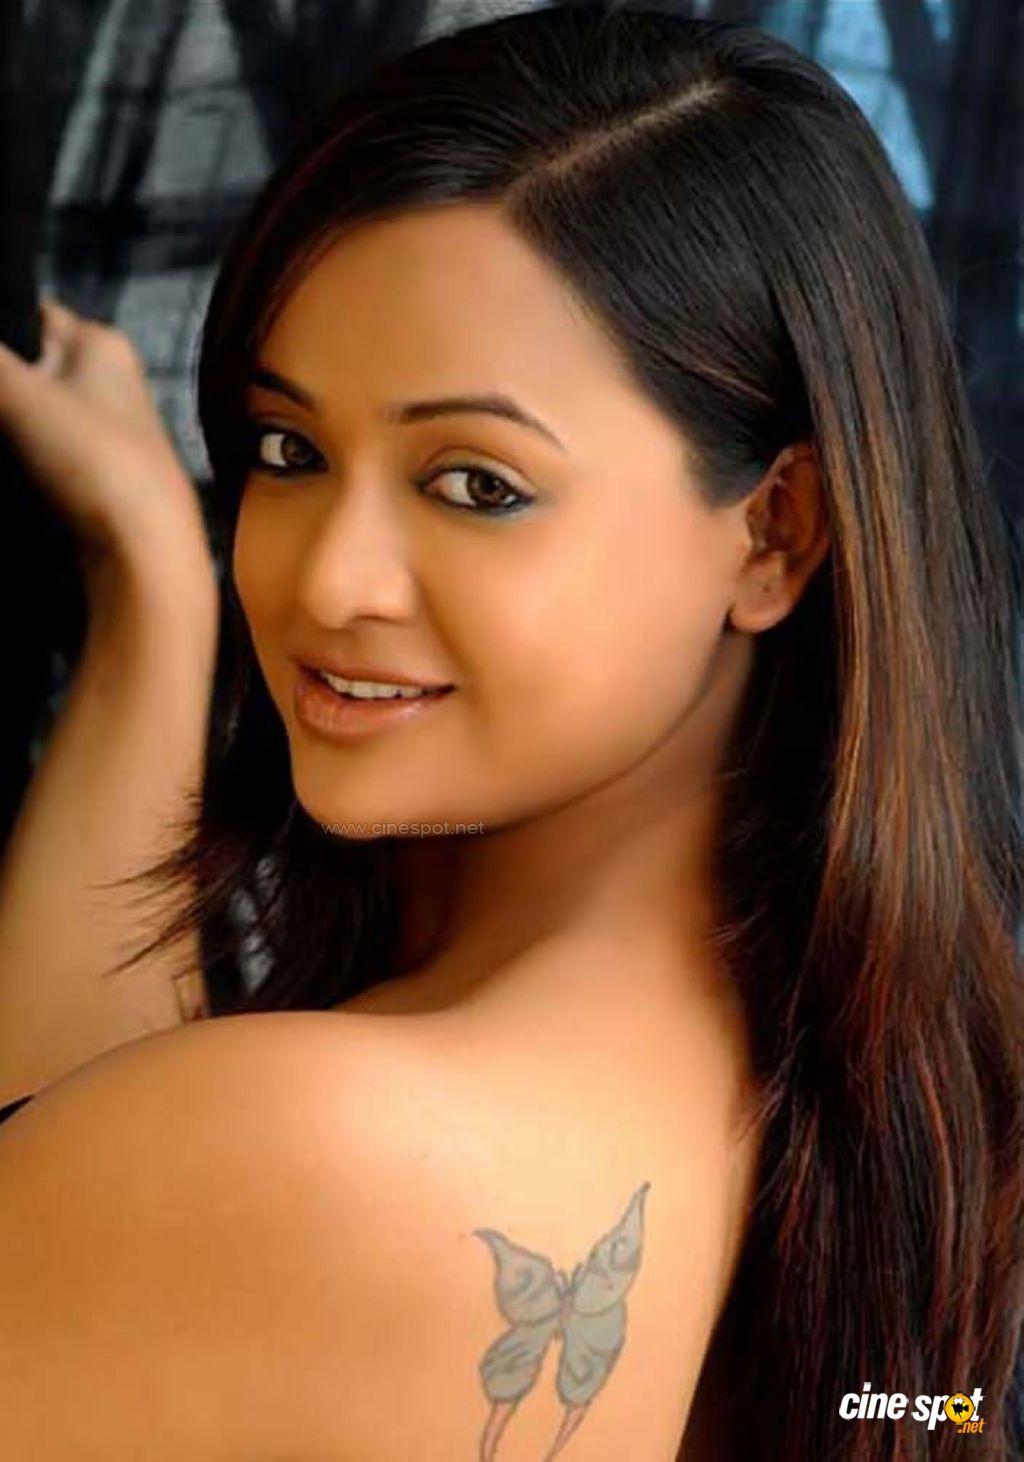 bengali celebrity ,hot models and seductive girl: rimjhim